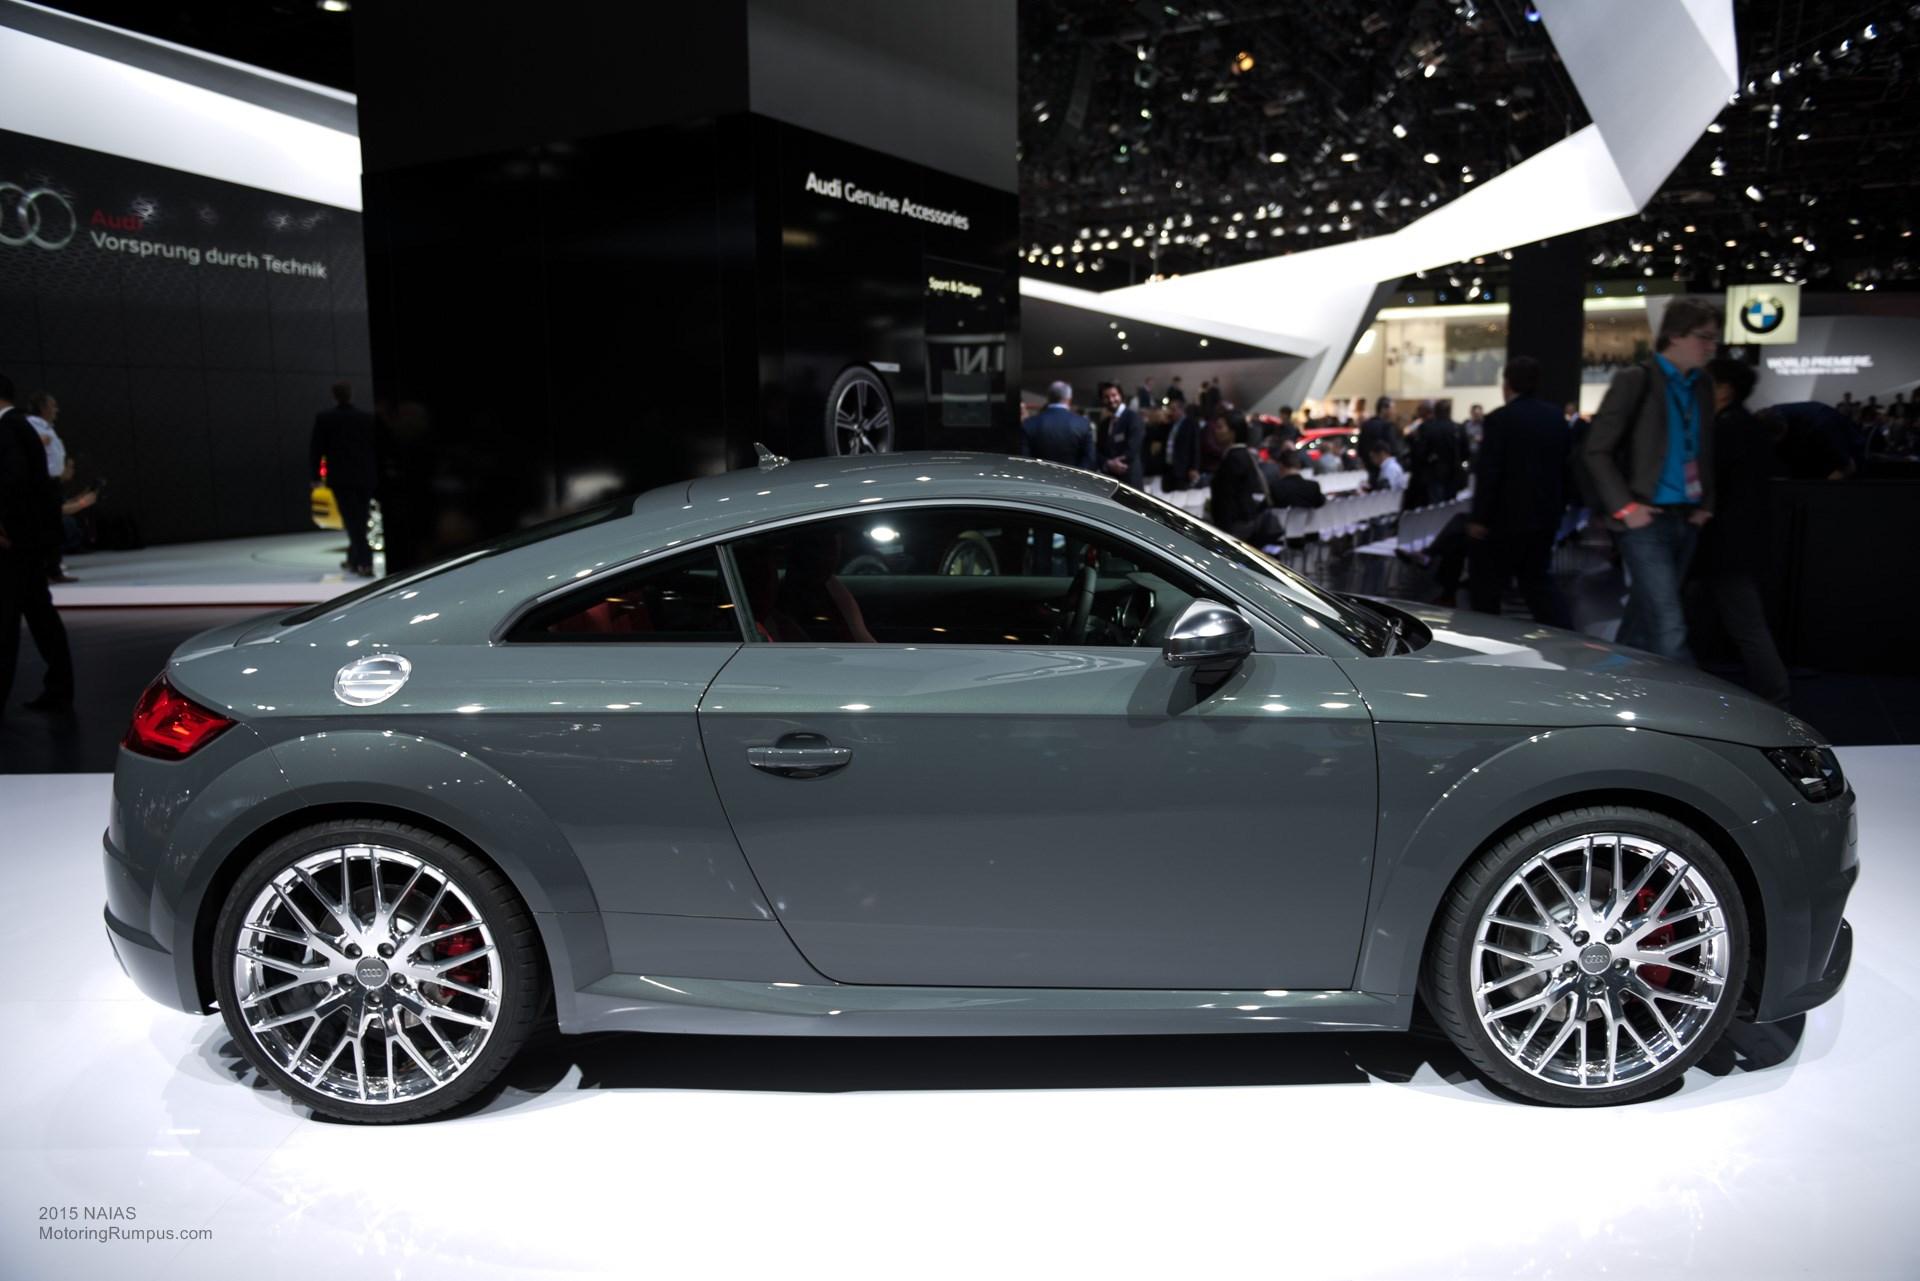 2015 NAIAS - 2016 Audi TTS